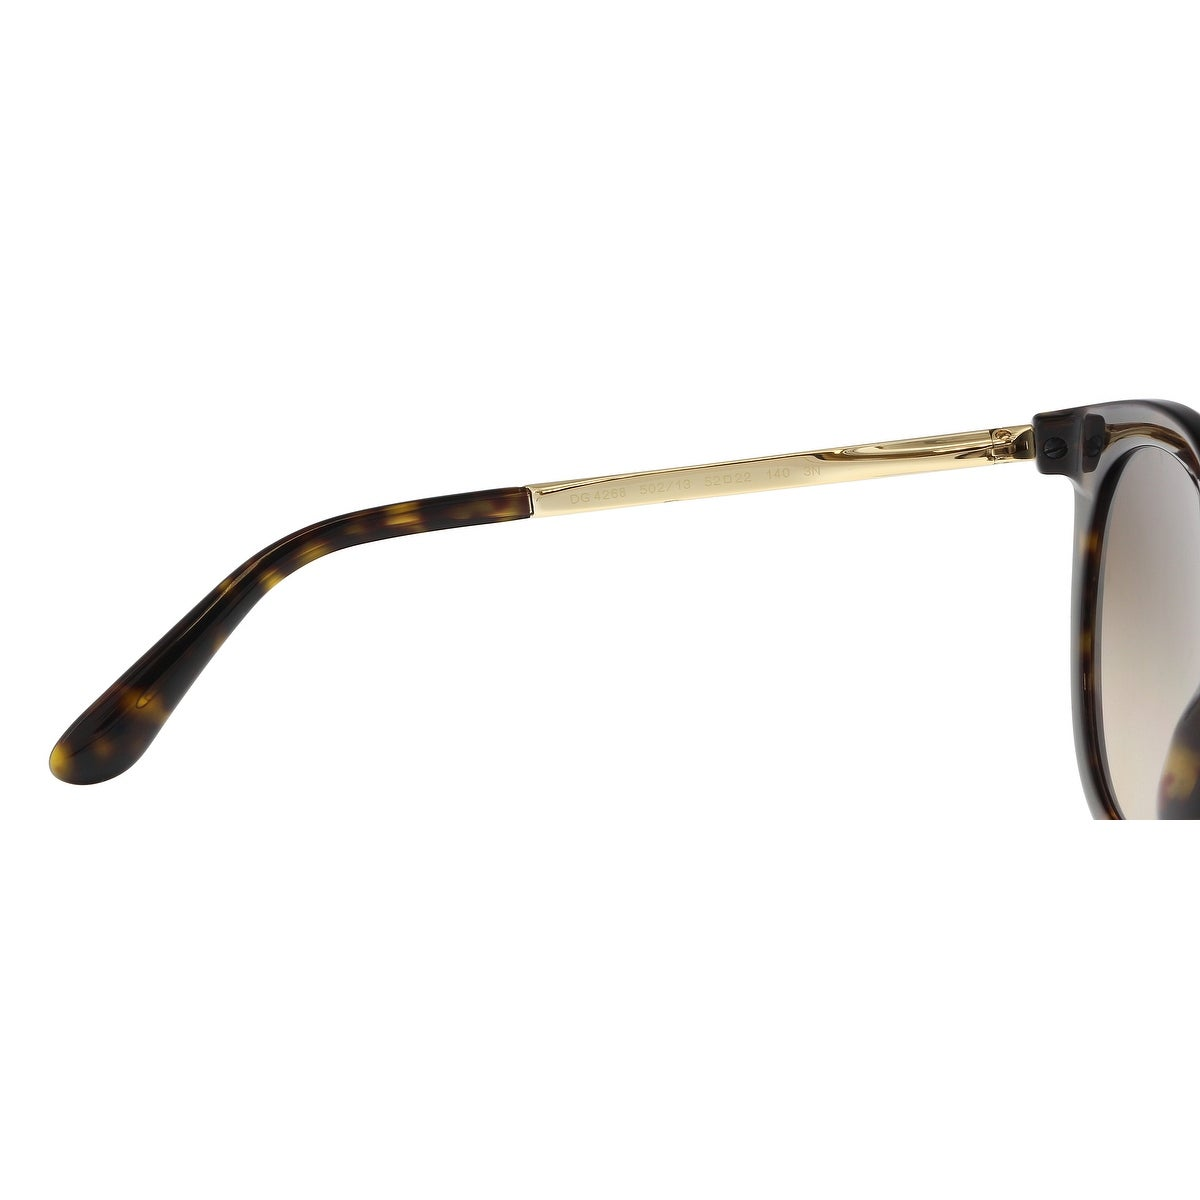 03819735a1 Dolce   Gabbana DG4268 502 13 Havana Cat Eye Sunglasses - 52-22-140 - Free  Shipping Today - Overstock.com - 26933146